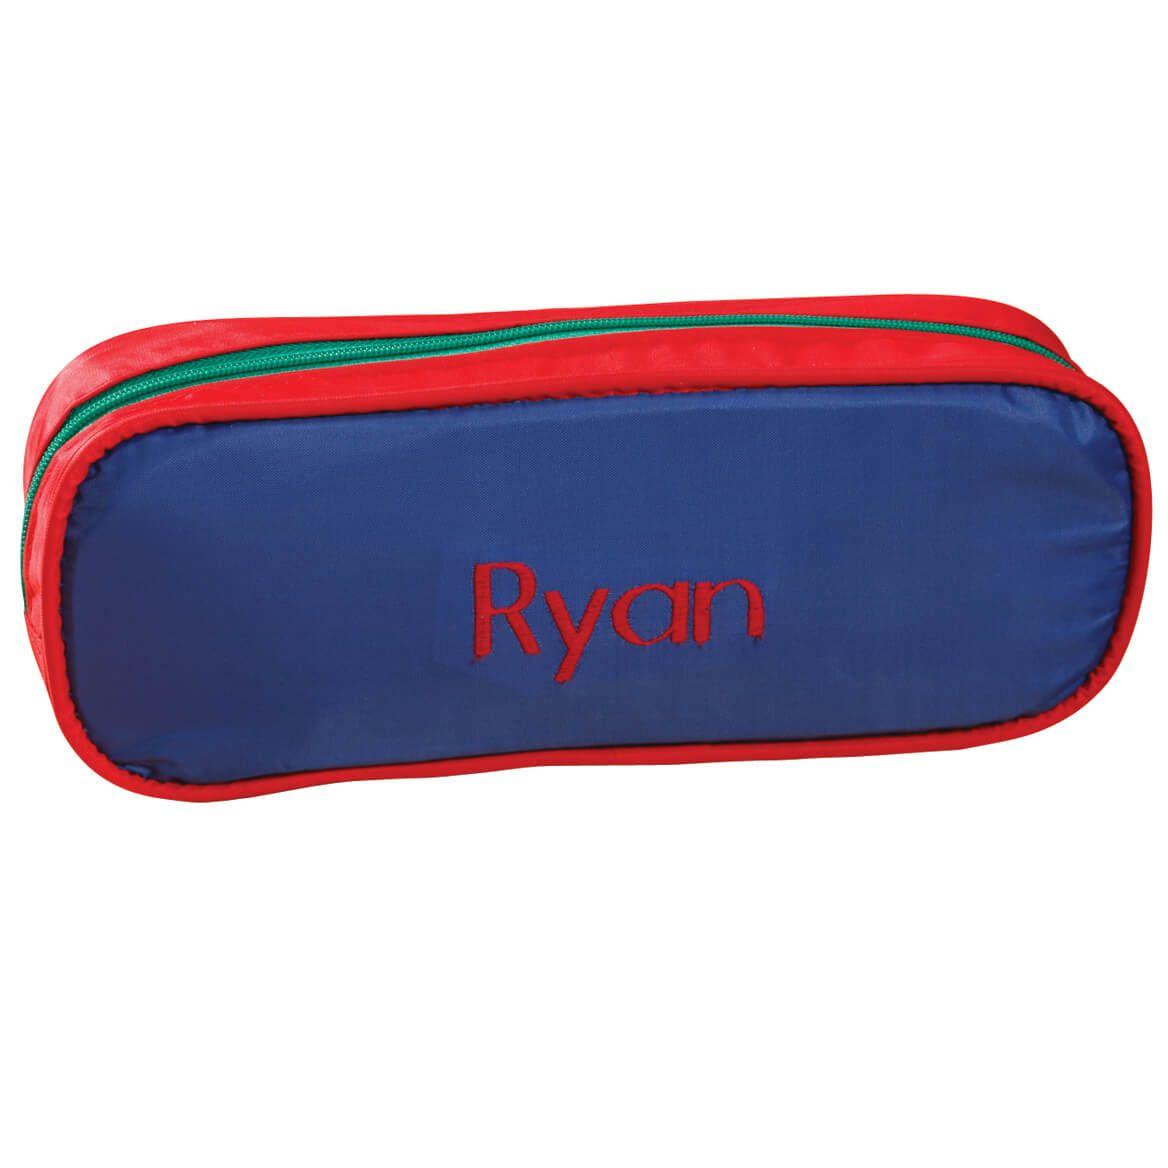 Personalized Sports Pencil Case-335221